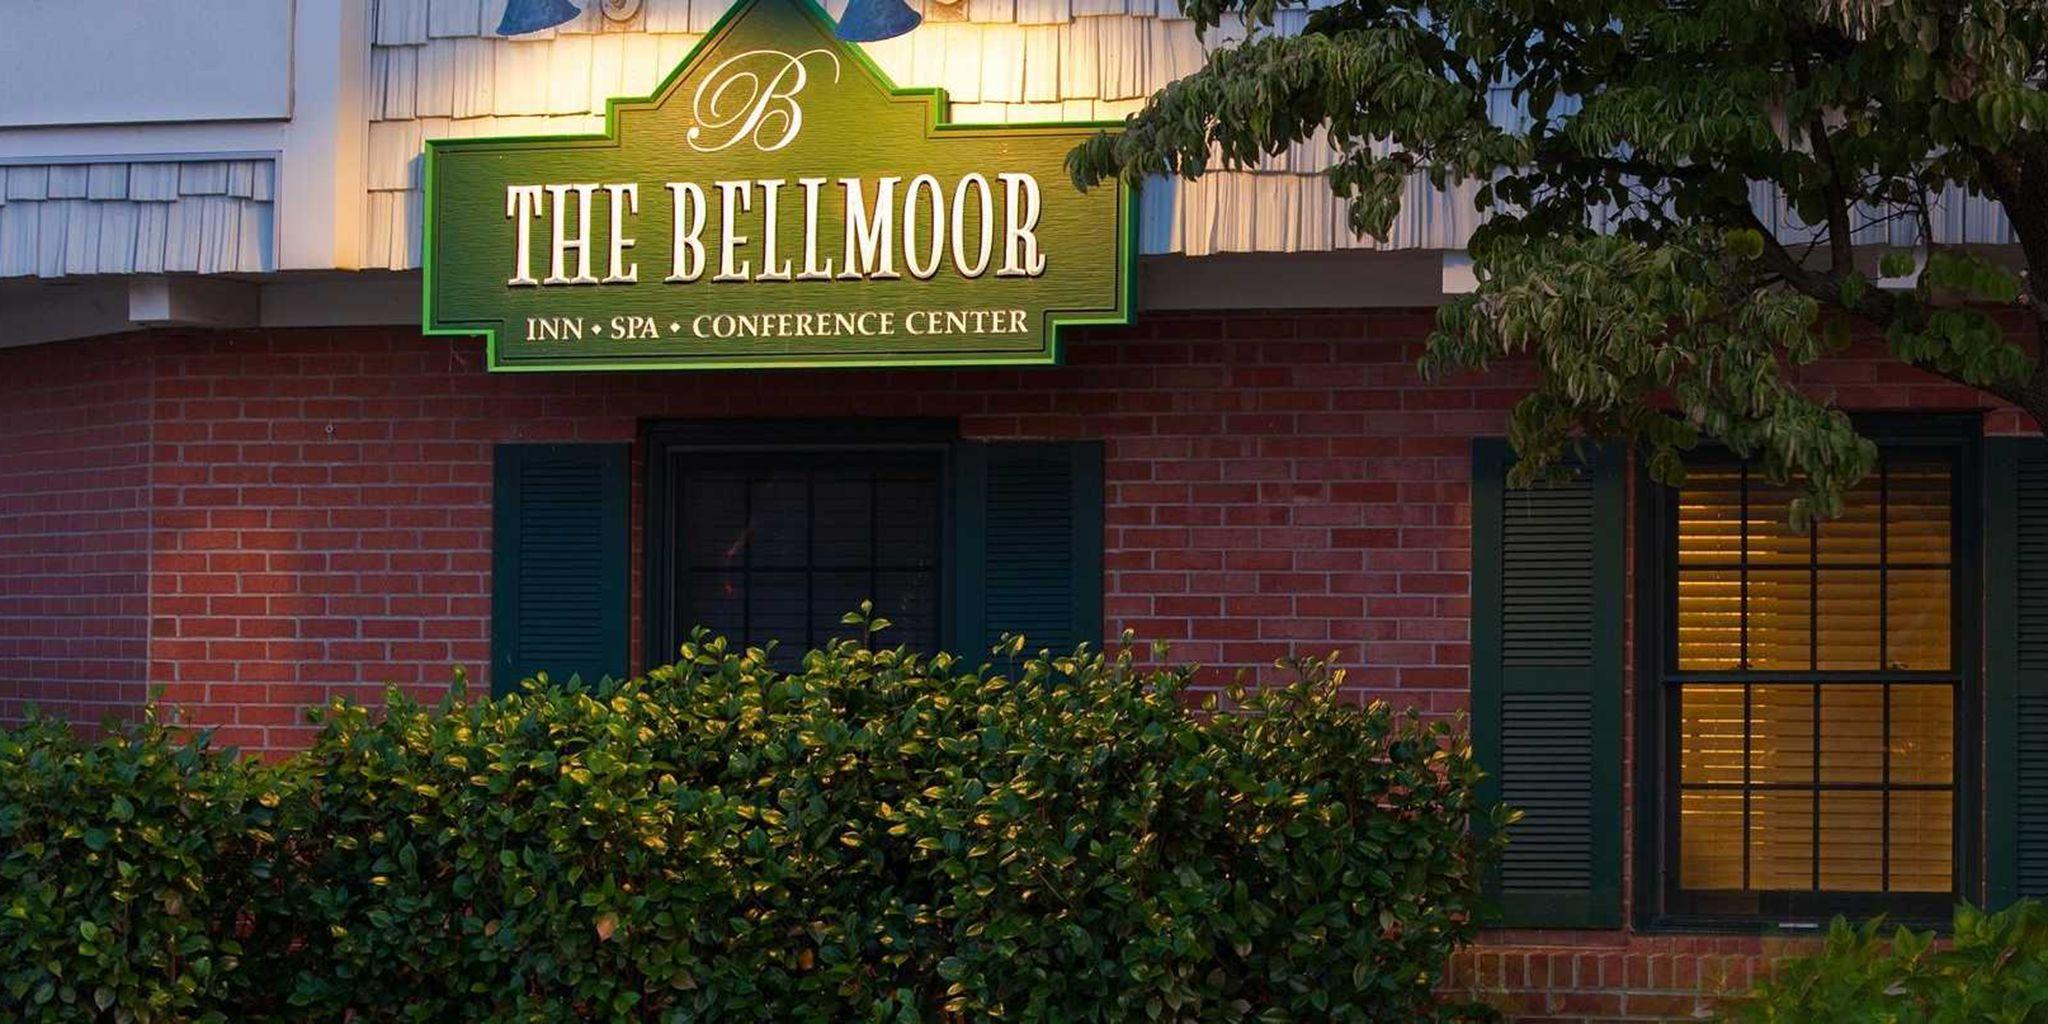 The Bellmoor Inn & Spa